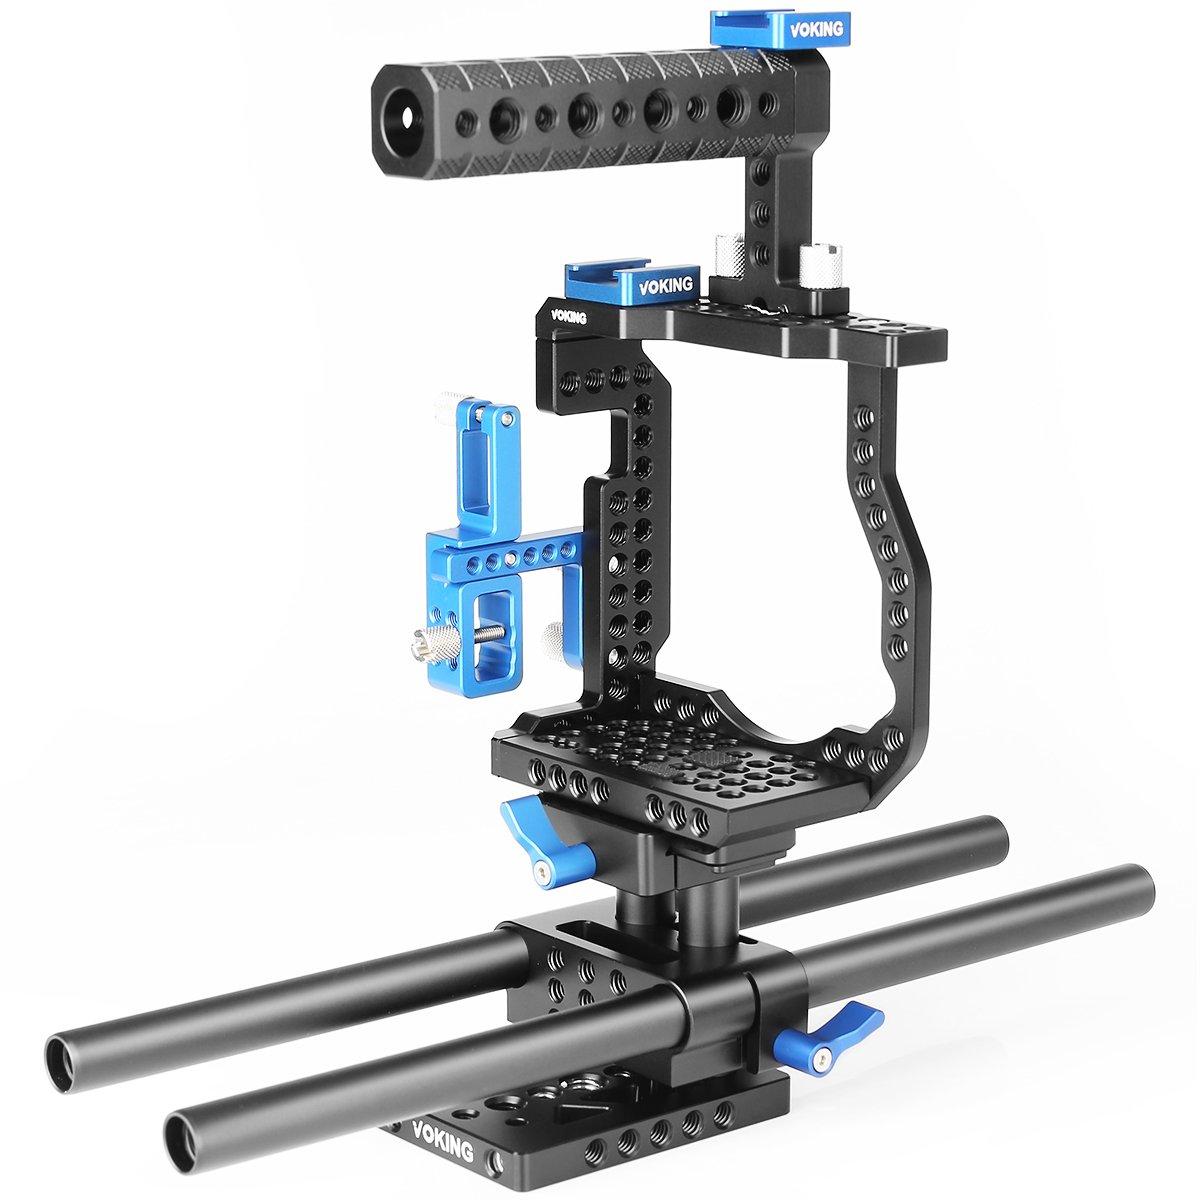 Voking VK GH5B - Kit de jaula de vídeo para cámara Lumix GH5 ...